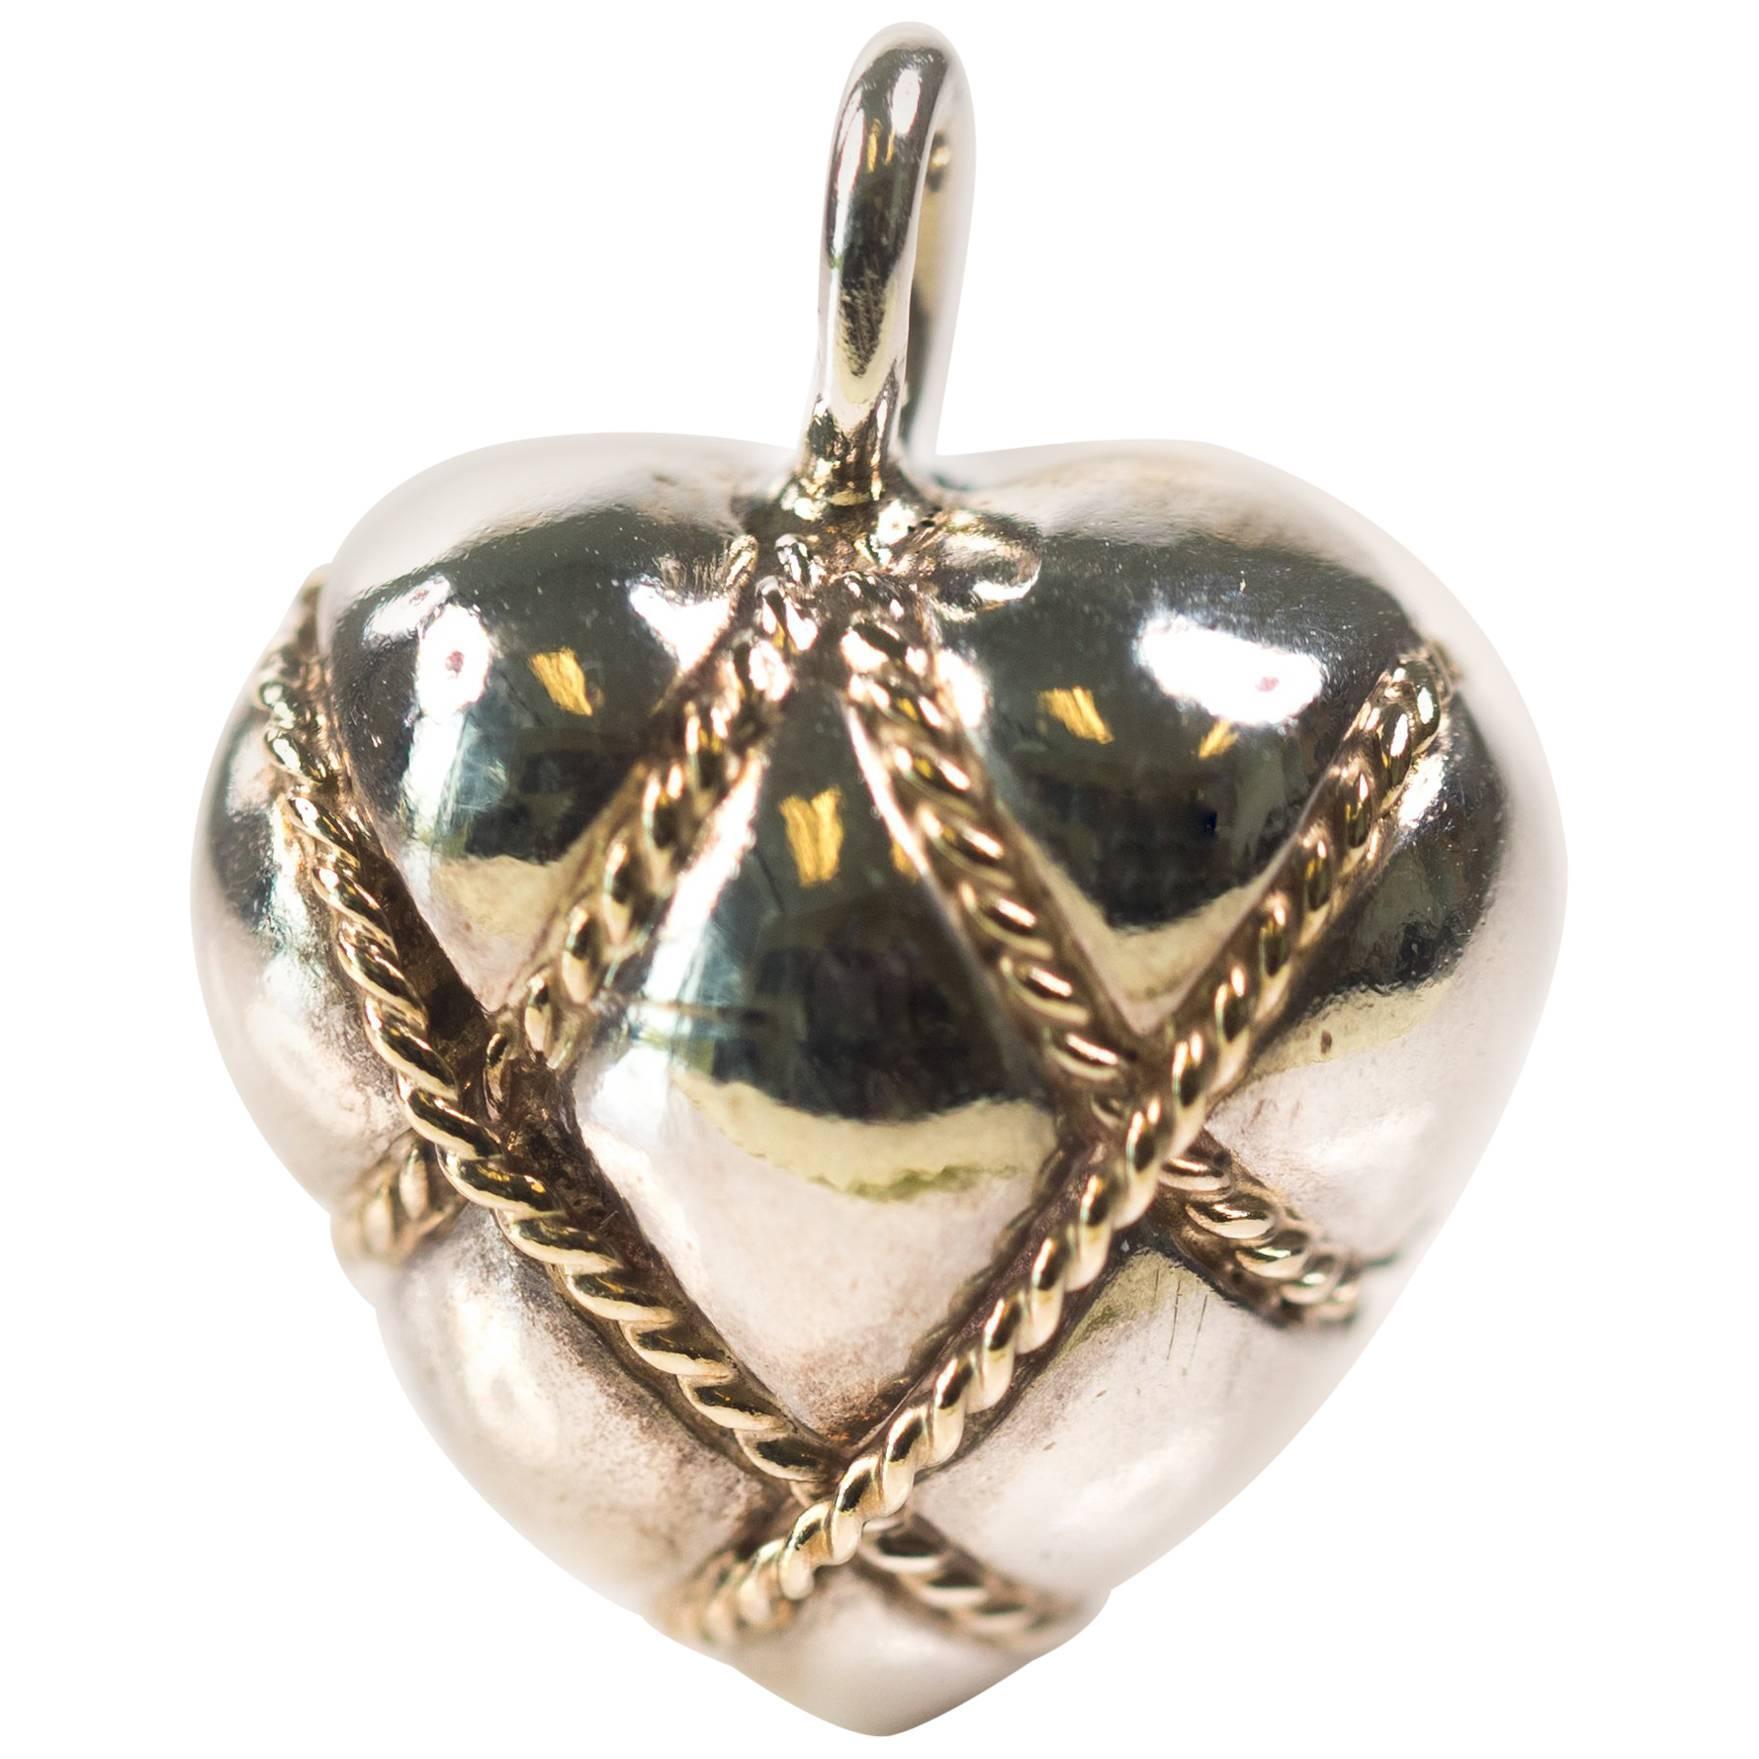 Tiffany & Co. Sterling Silver, 14 Karat Yellow Gold Puffed Heart Pendant Charm